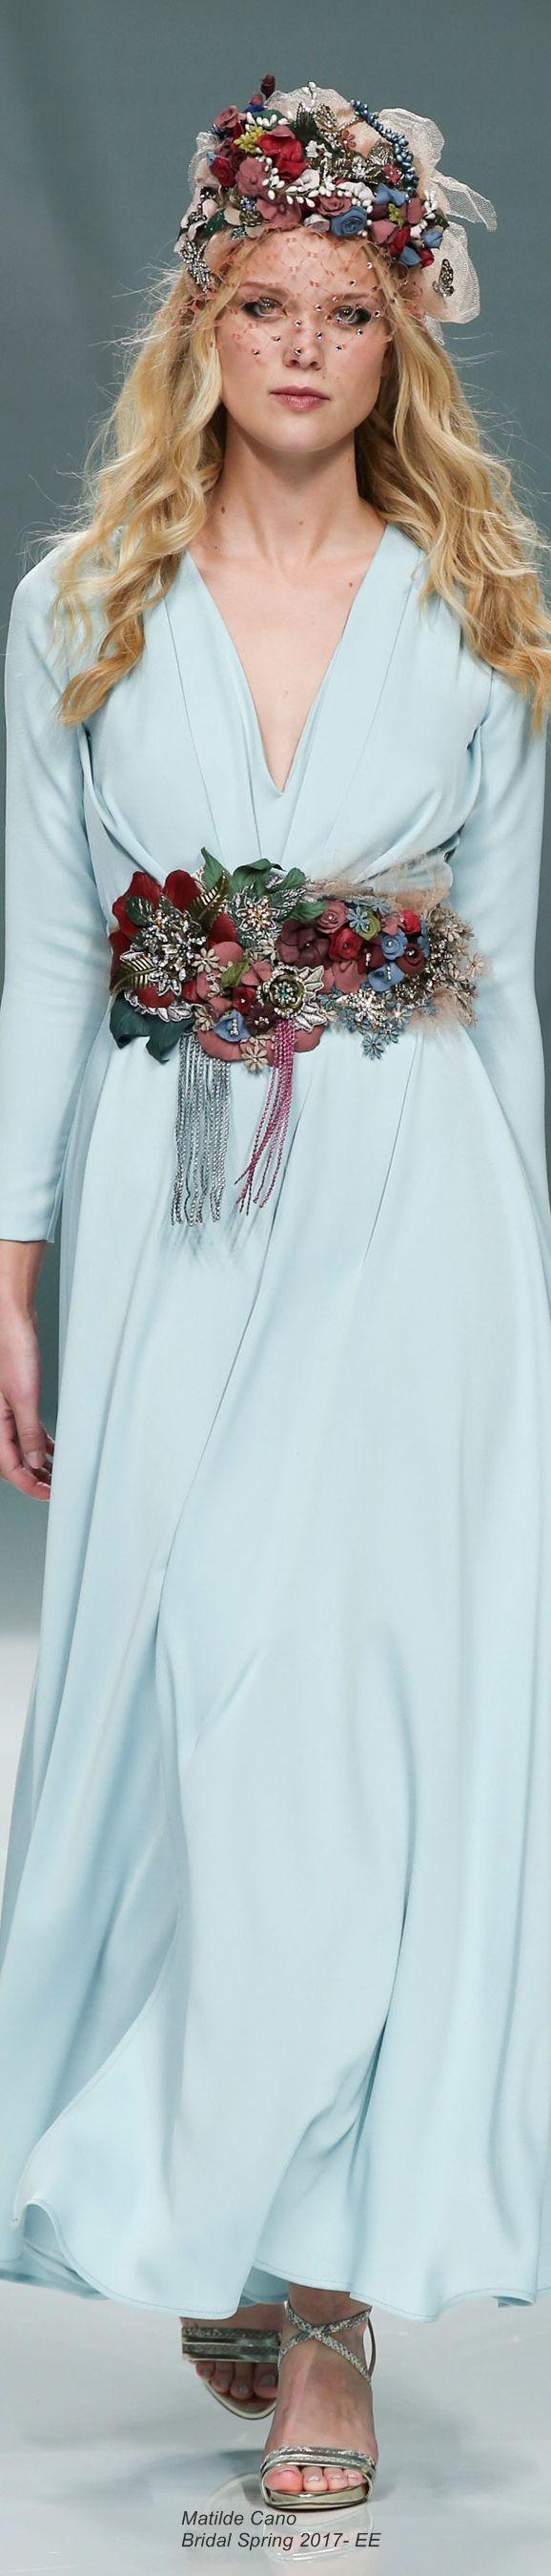 Matilde Cano   Bridal Spring 2017- EE